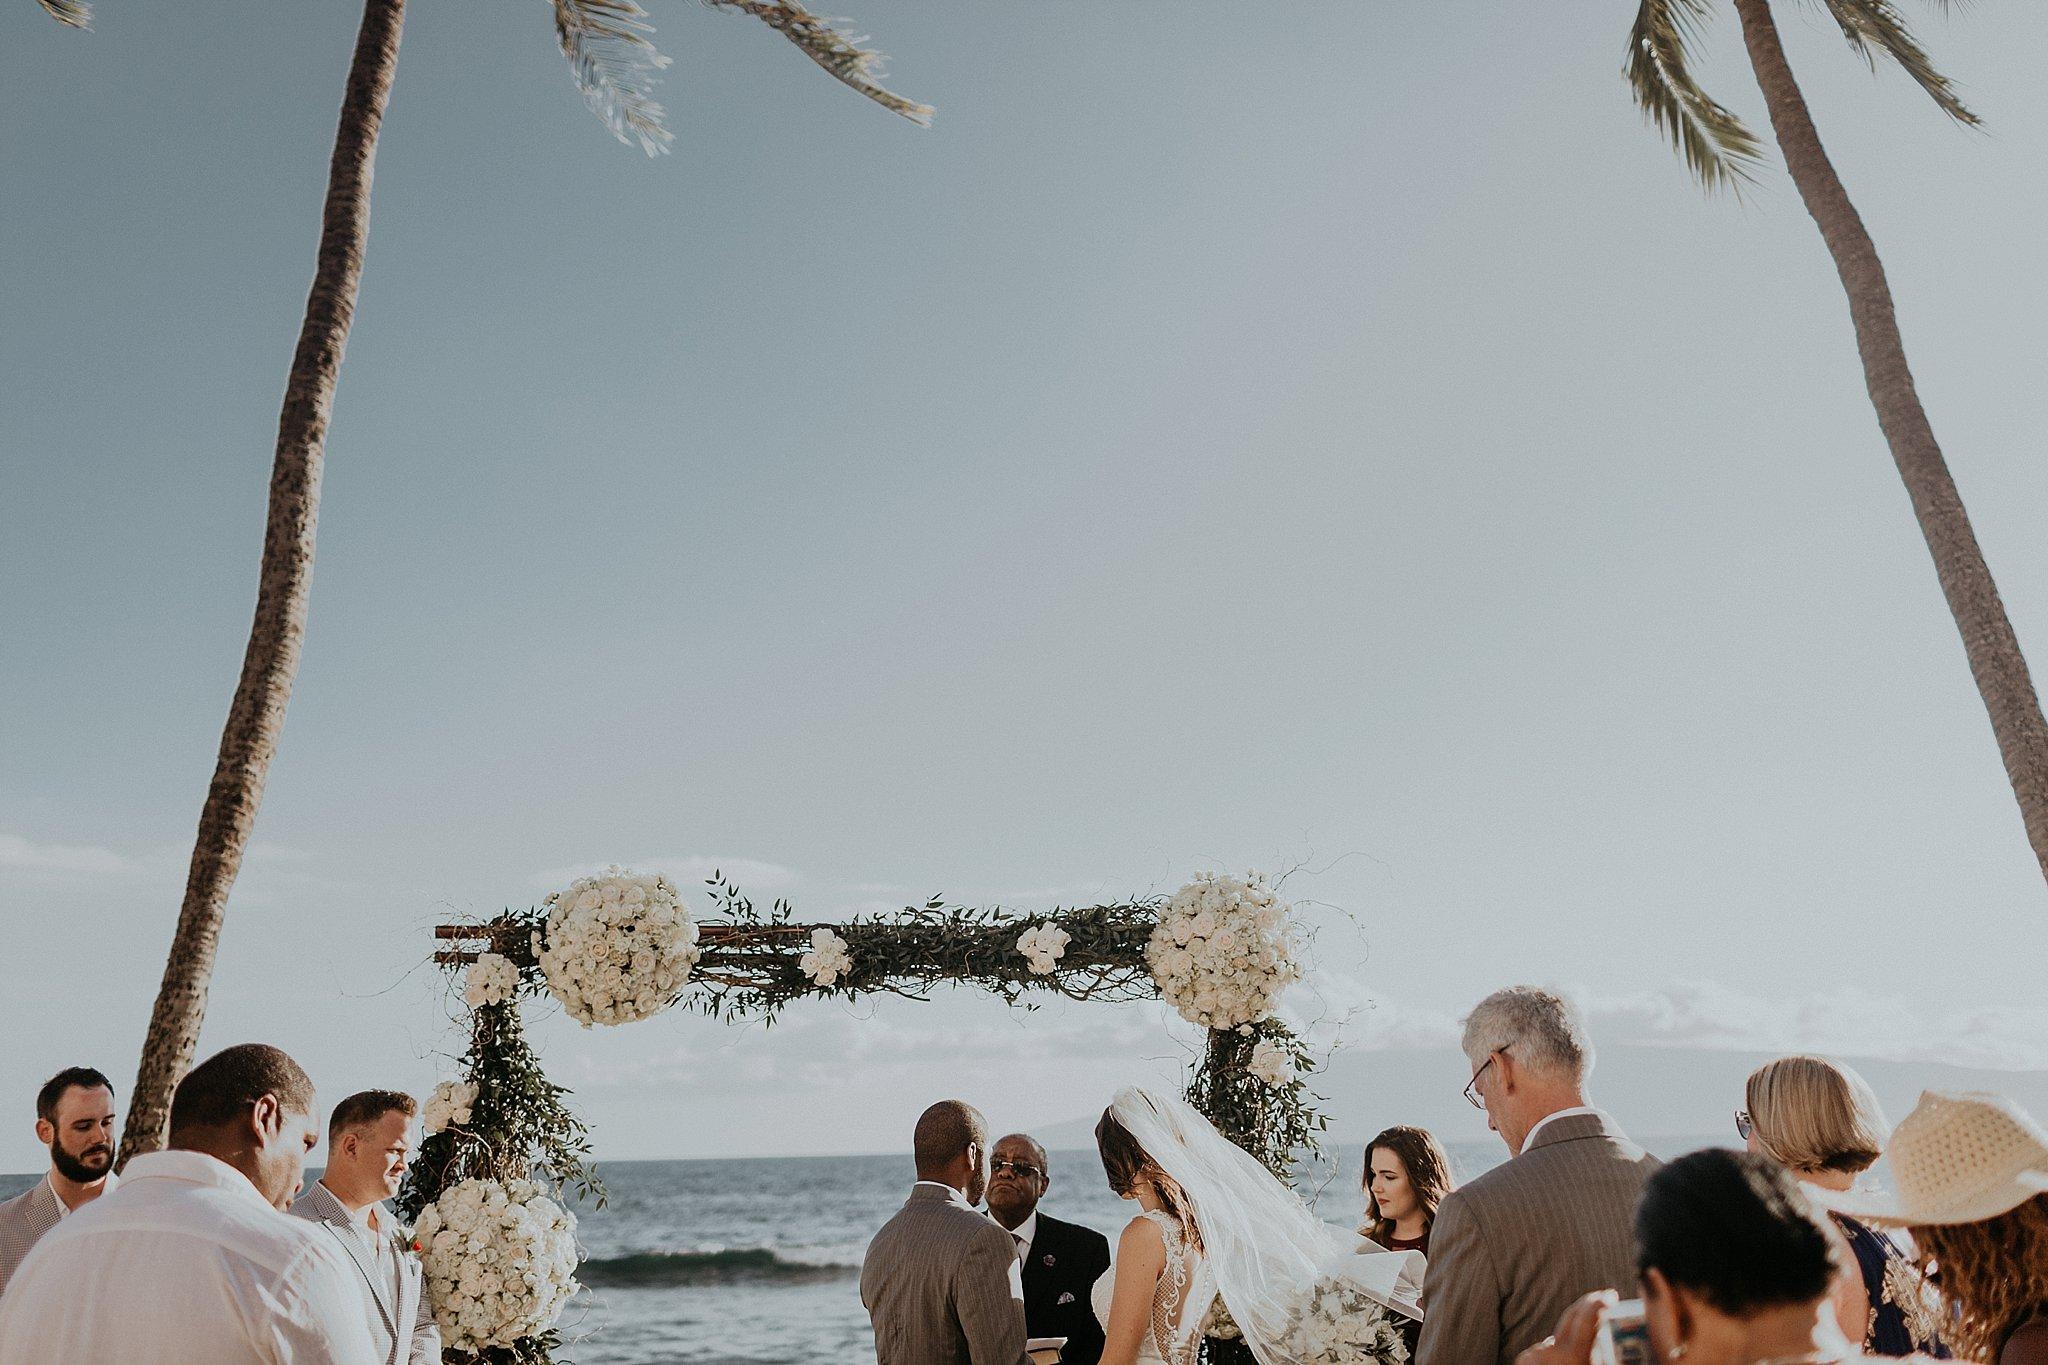 samantha_mcfarlen_bellingham_washington_engagement_photography_seattle_wedding_photographer_0213.jpg